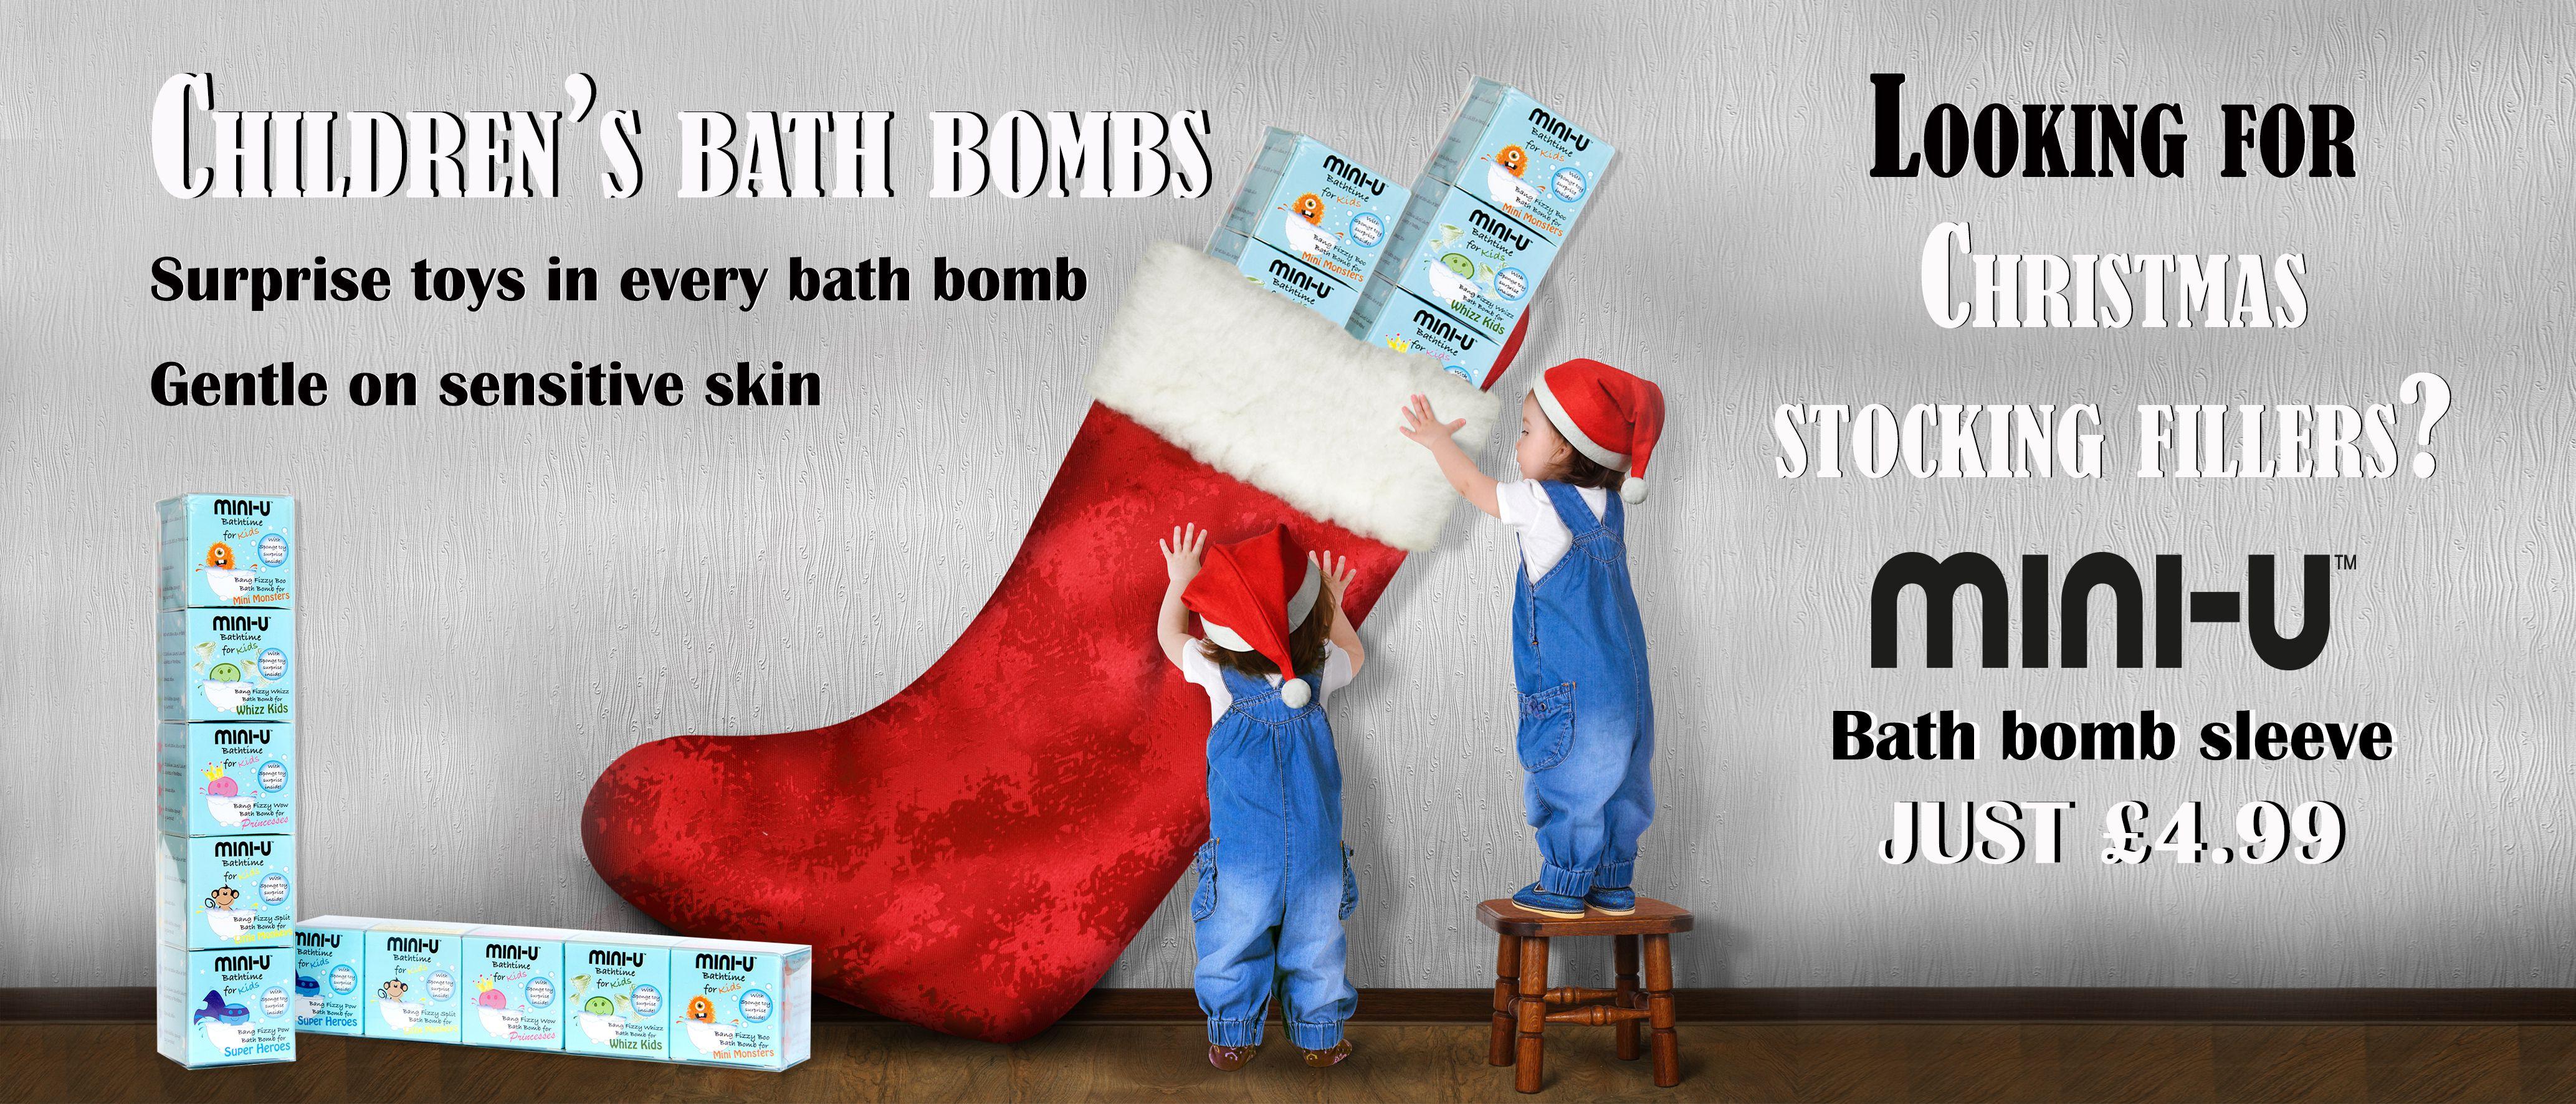 Bath-bomb-sleeve-2018